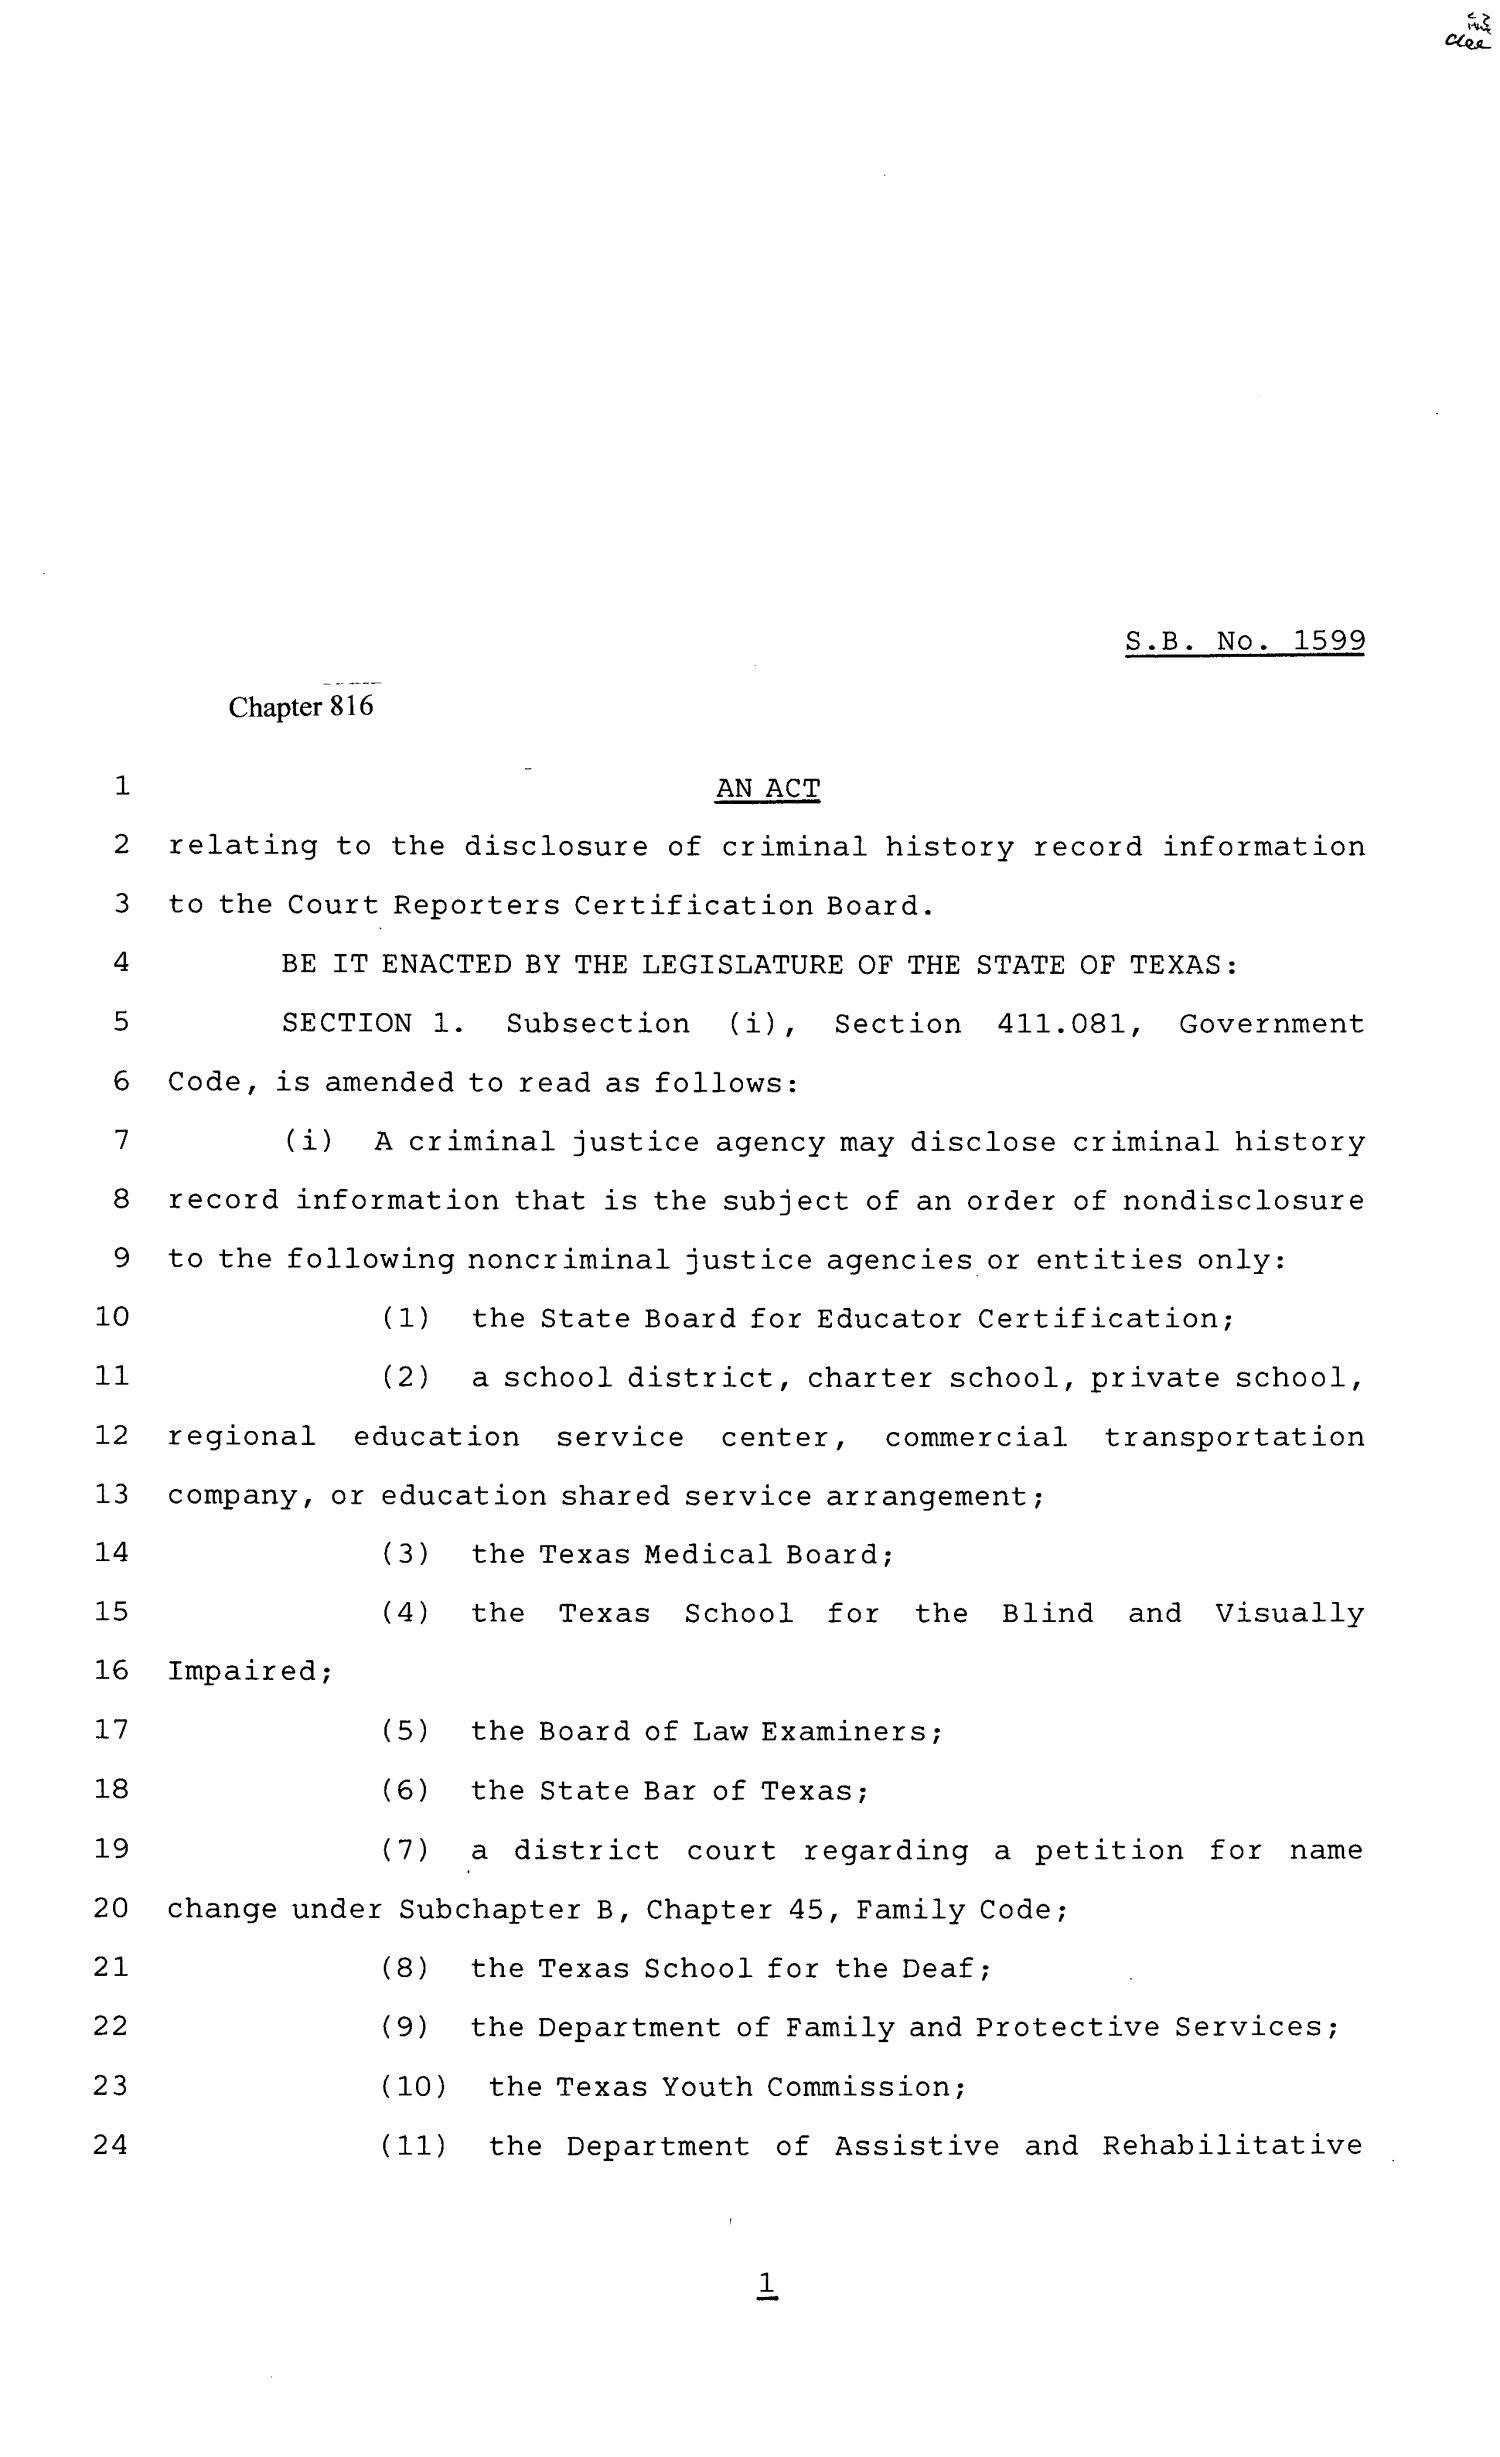 81st texas legislature senate bill 1599 chapter 816 the portal 81st texas legislature senate bill 1599 chapter 816 the portal to texas history xflitez Choice Image